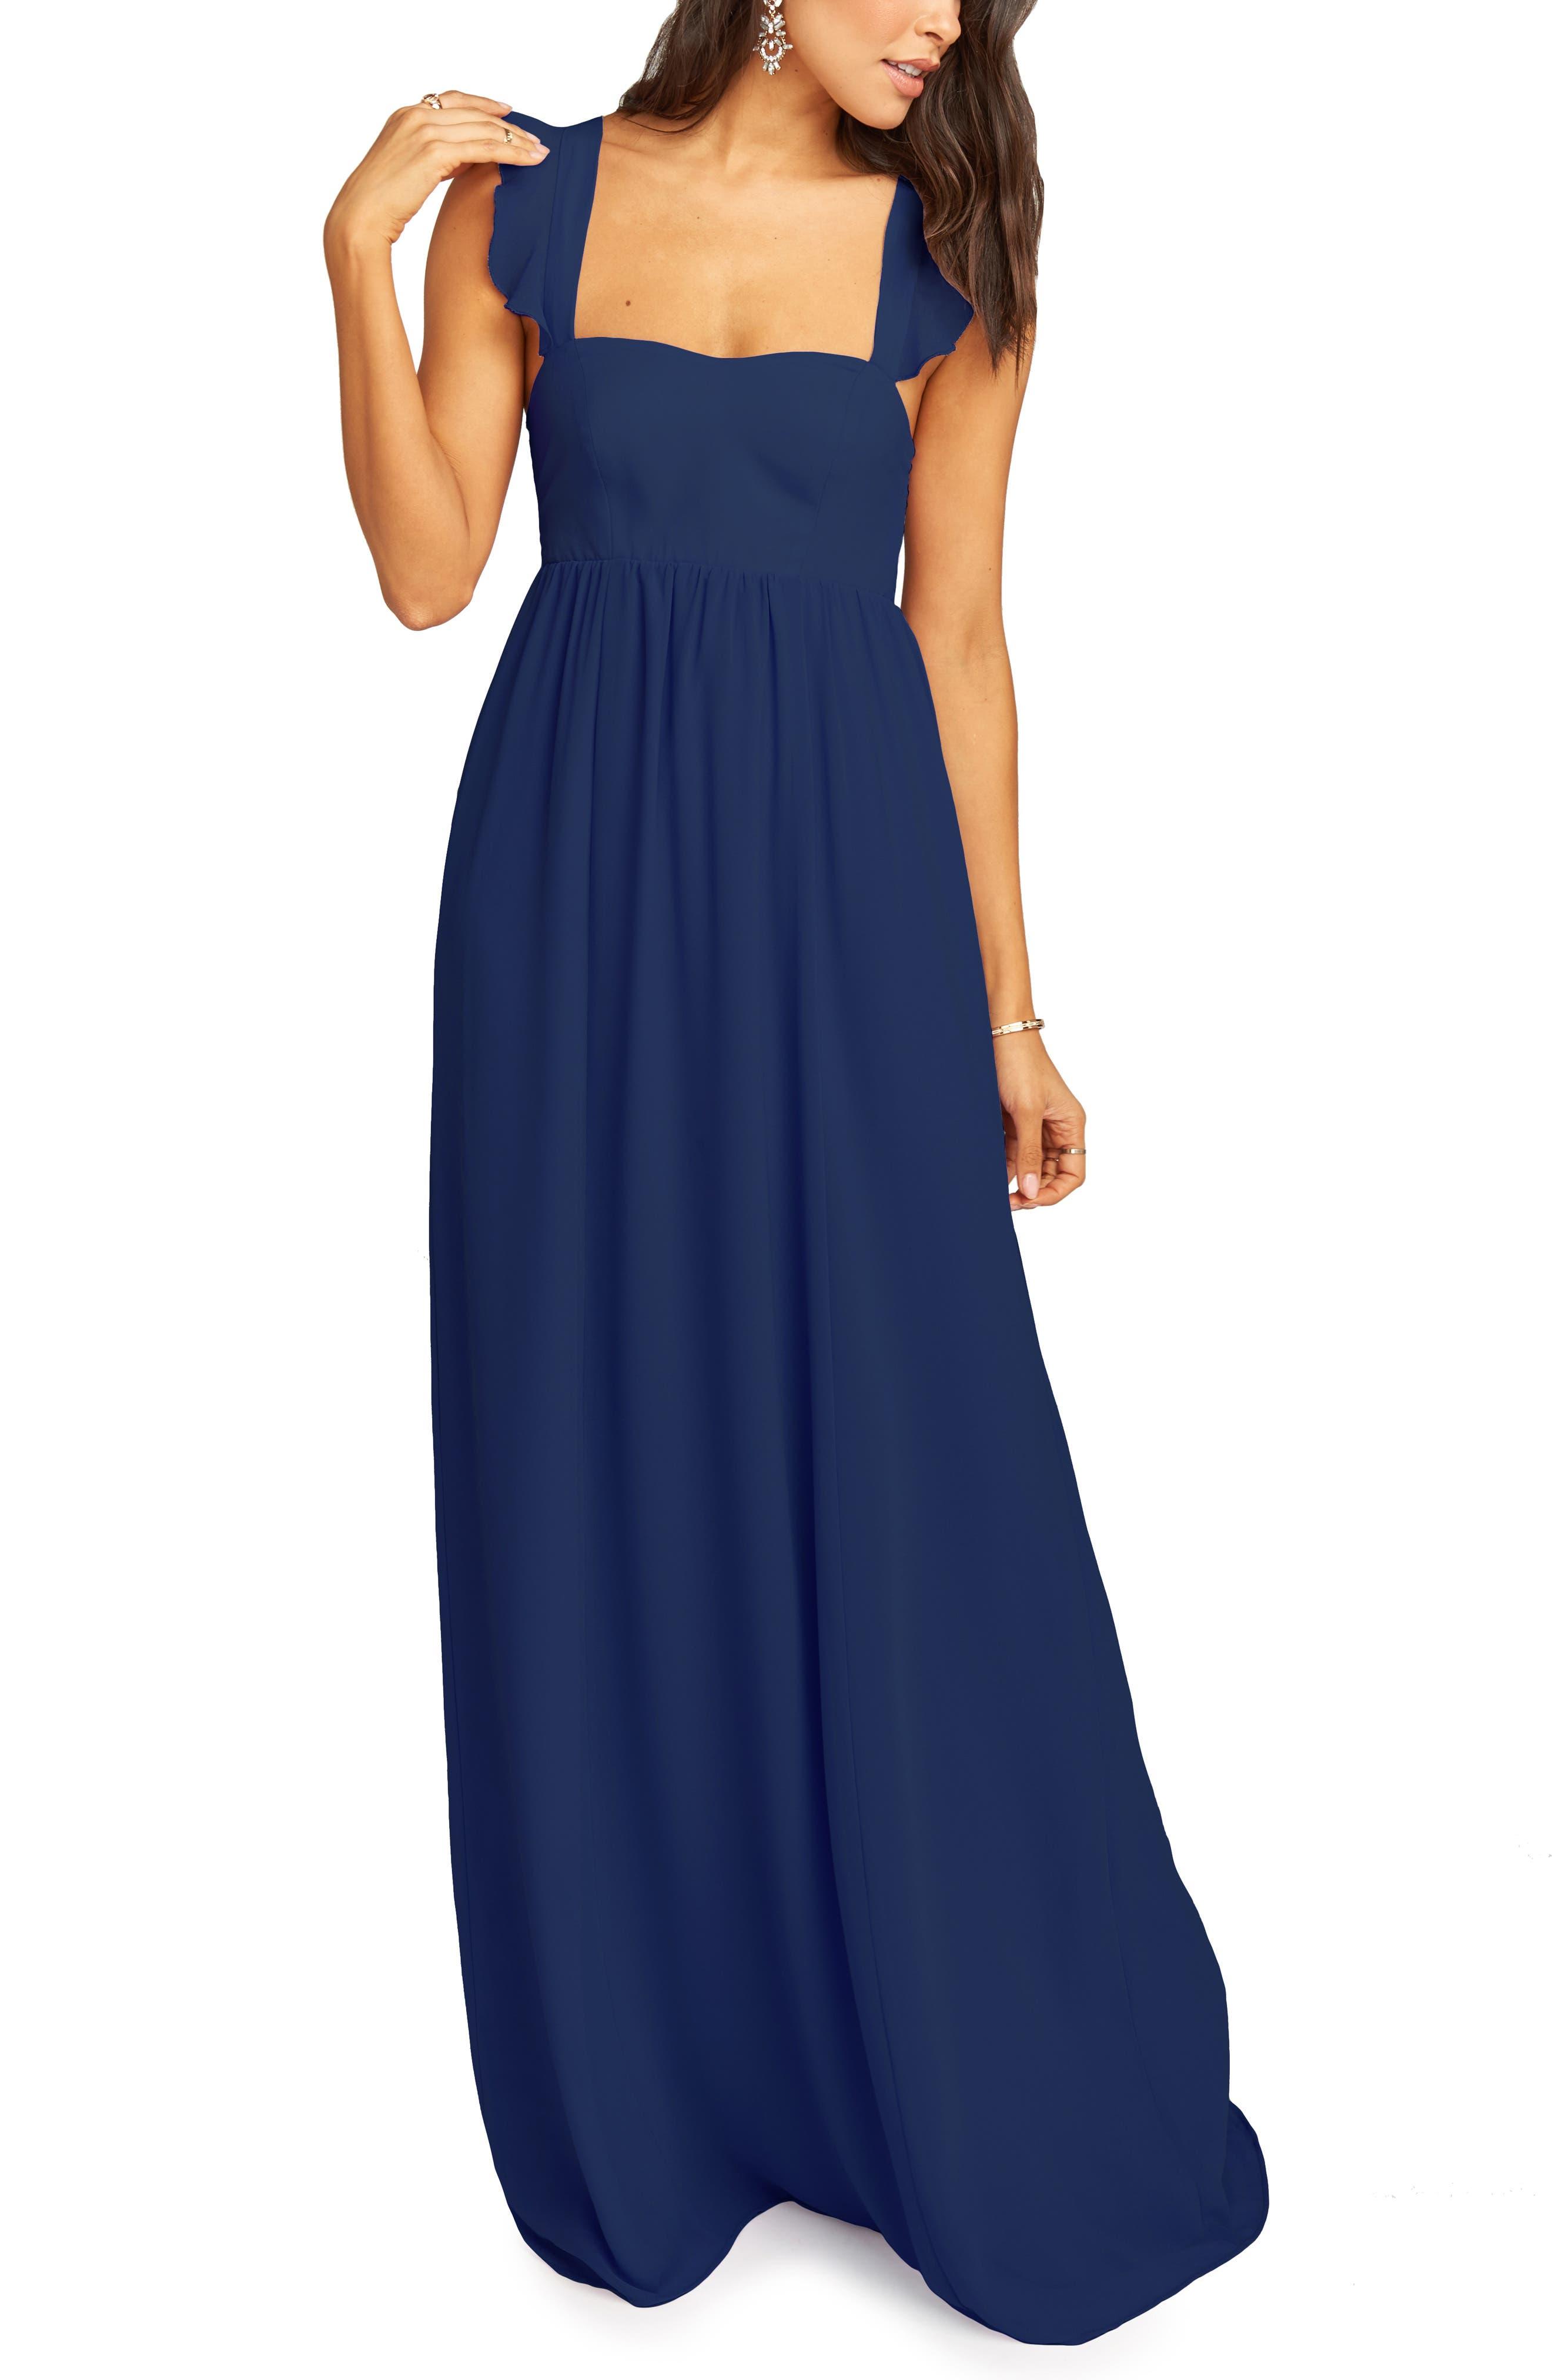 Show Me Your Mumu June Ruffle Strap Evening Dress, Blue